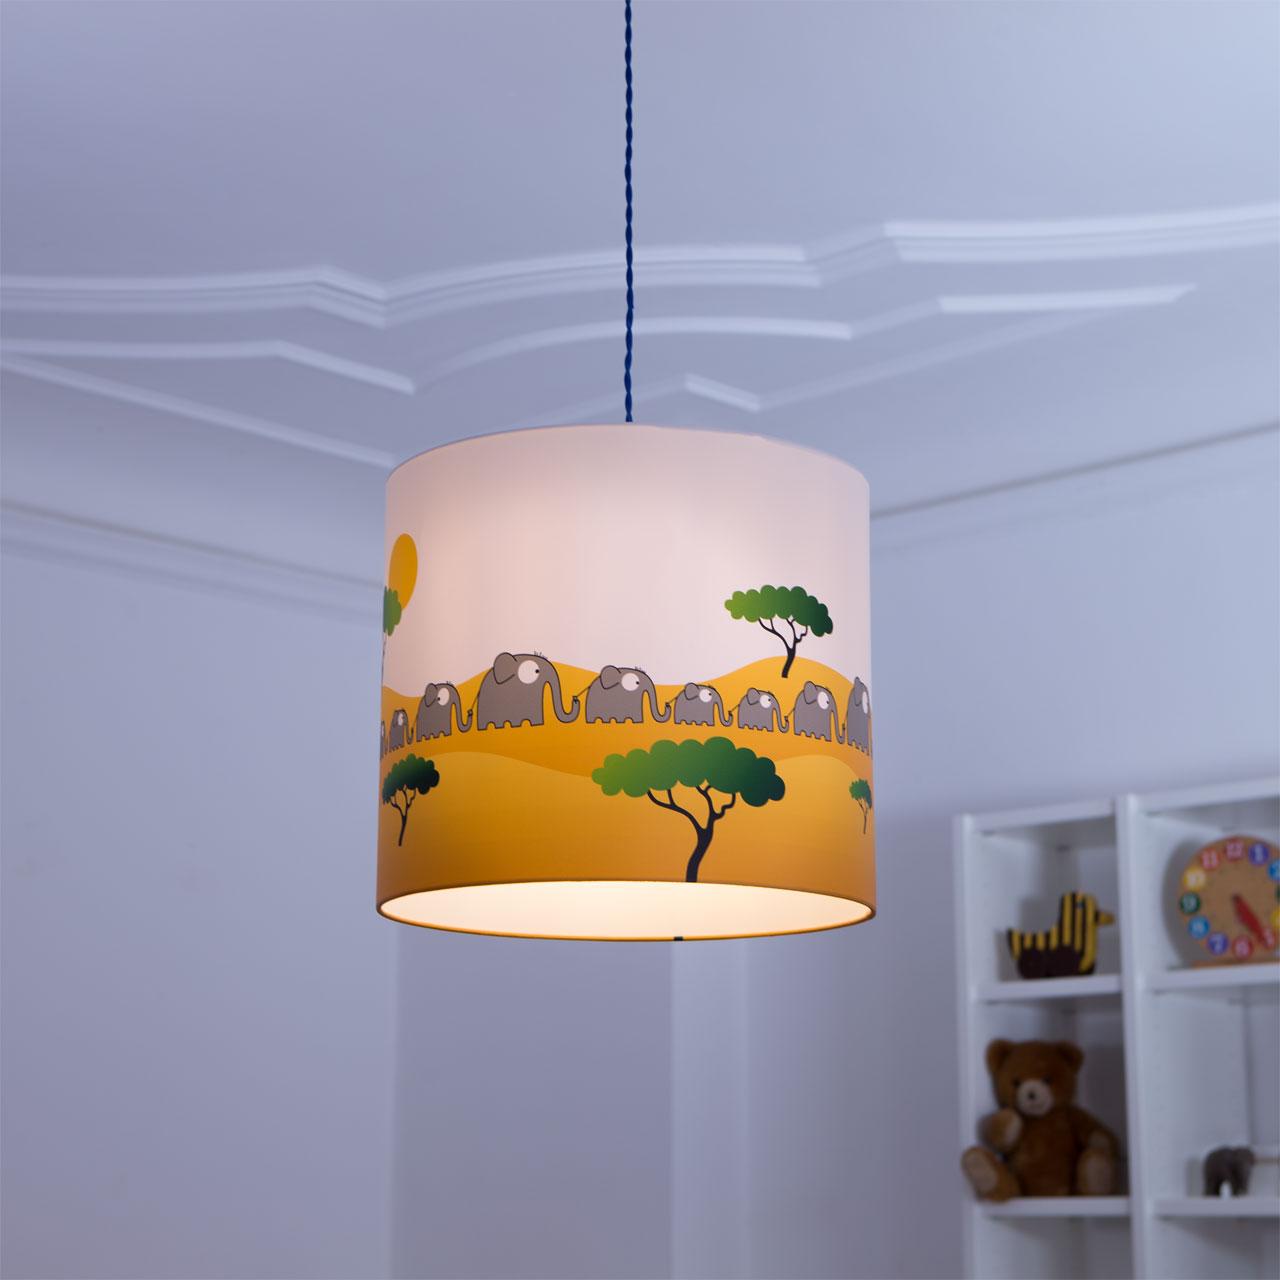 fantasia-40cm-pendant-light-from-limundo